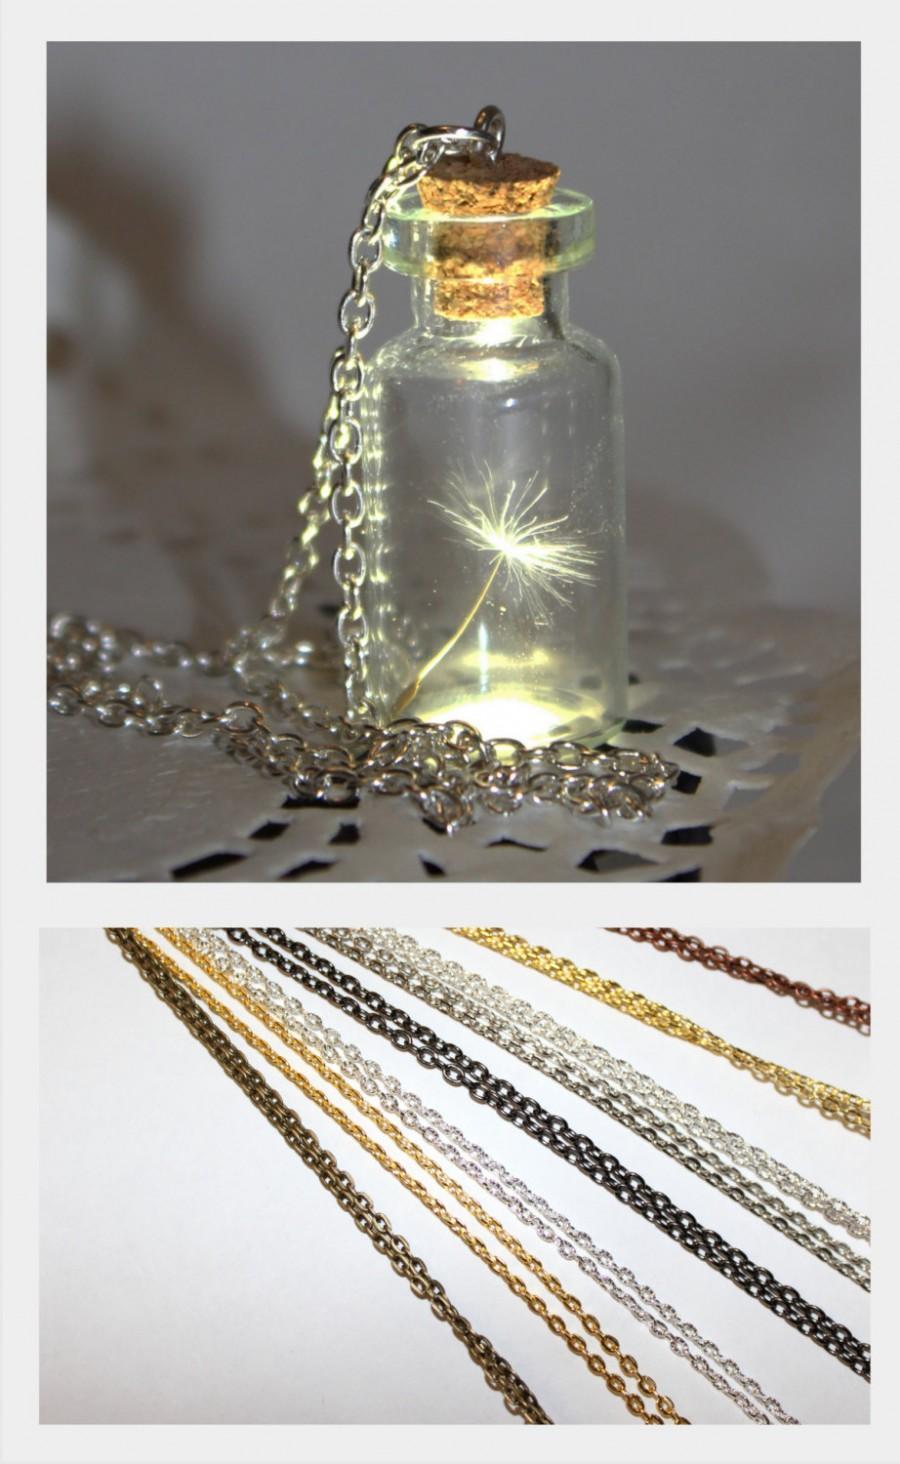 One Special Wish Dandelion Seed In A Bottle Jar Necklace Vial Terrarium Necklace Handmade Dandelion Jewelry Make A Wish Pendant 2503145 Weddbook